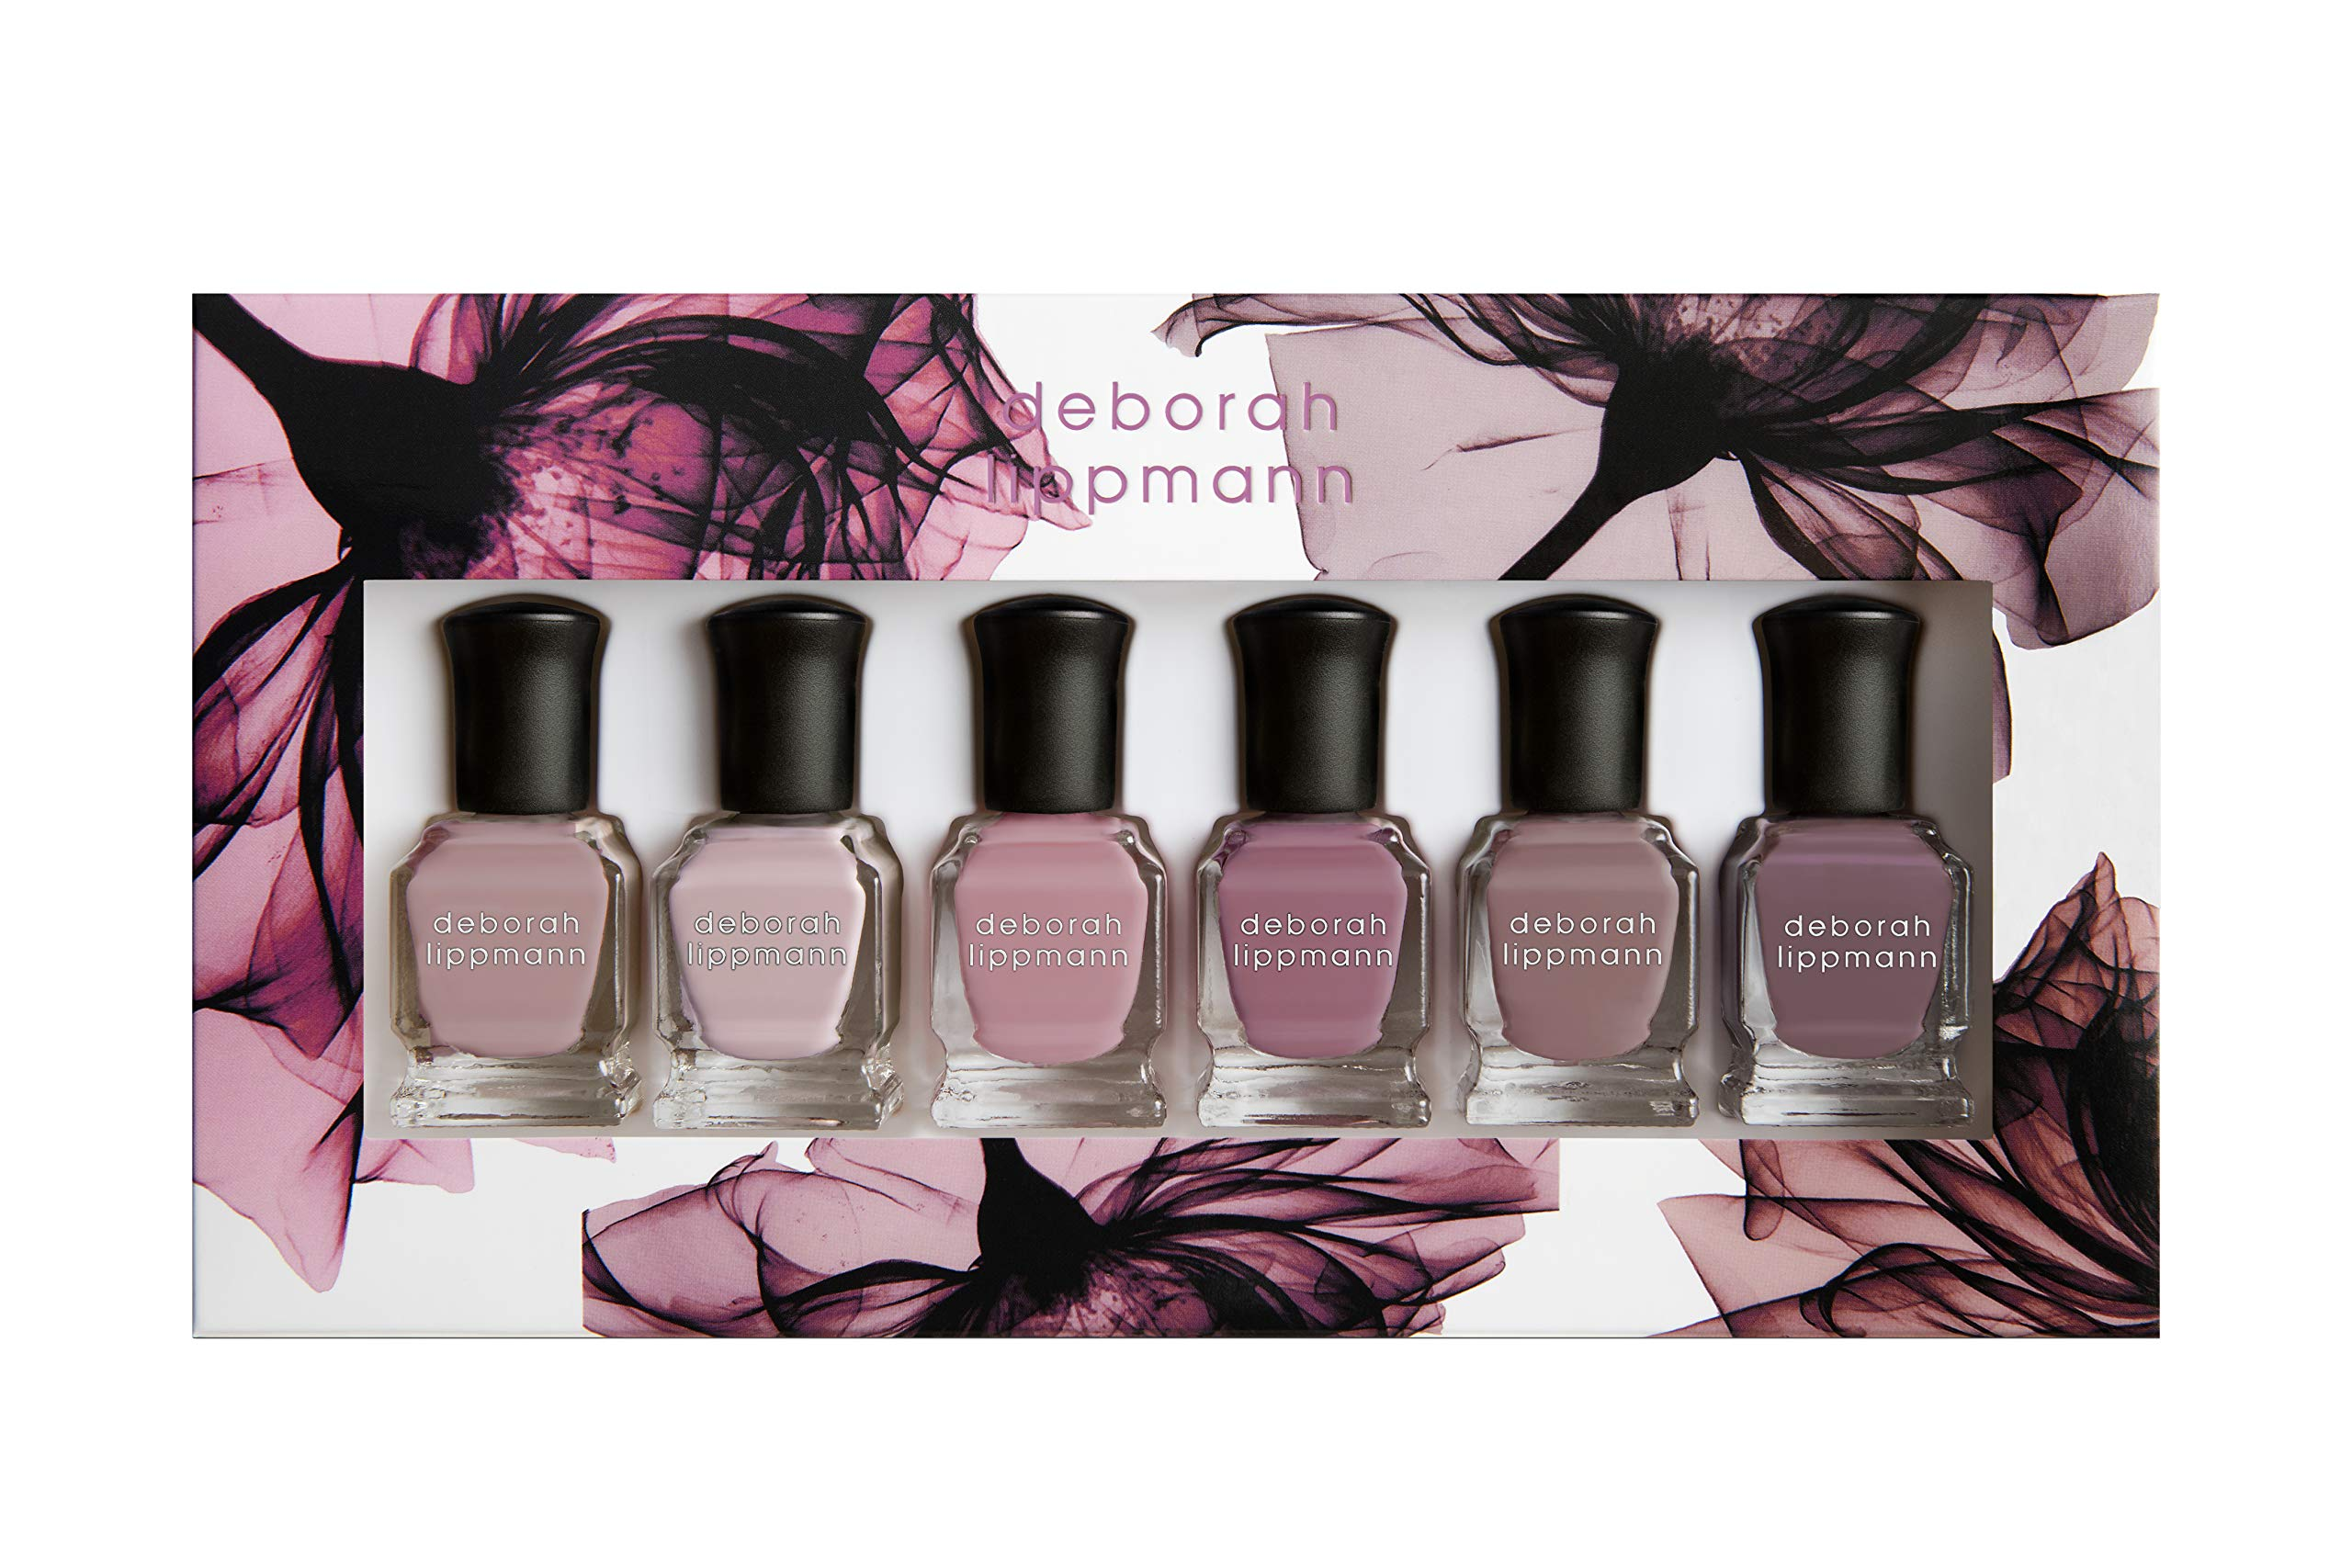 Amazon.com: Deborah Lippmann Nail Polish, Bed Of Roses, 0.27 Fl. Oz ...